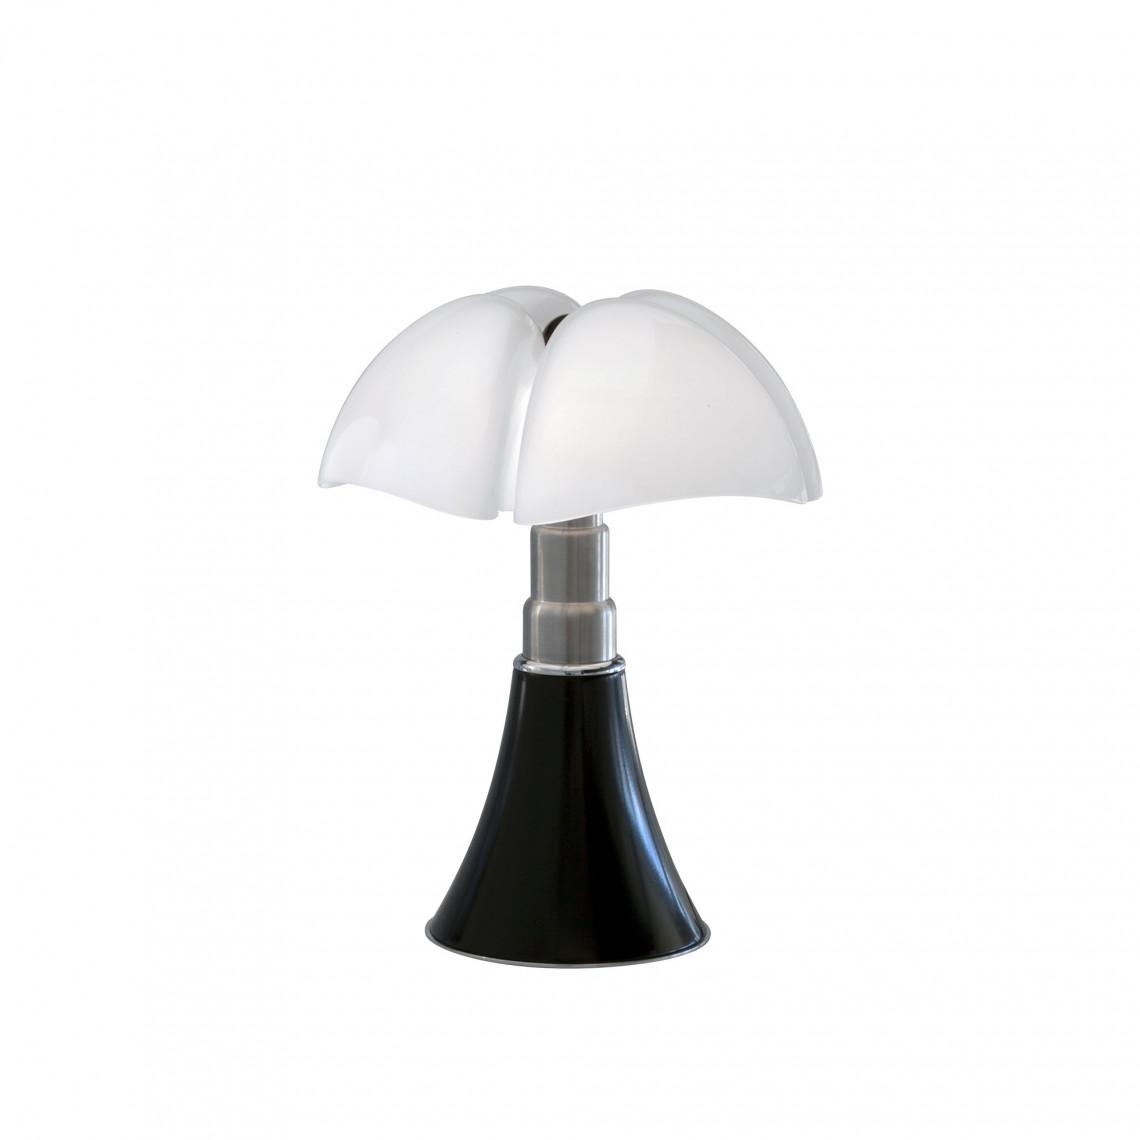 Minipipistrello Cordless Table Lamp Dark Brown